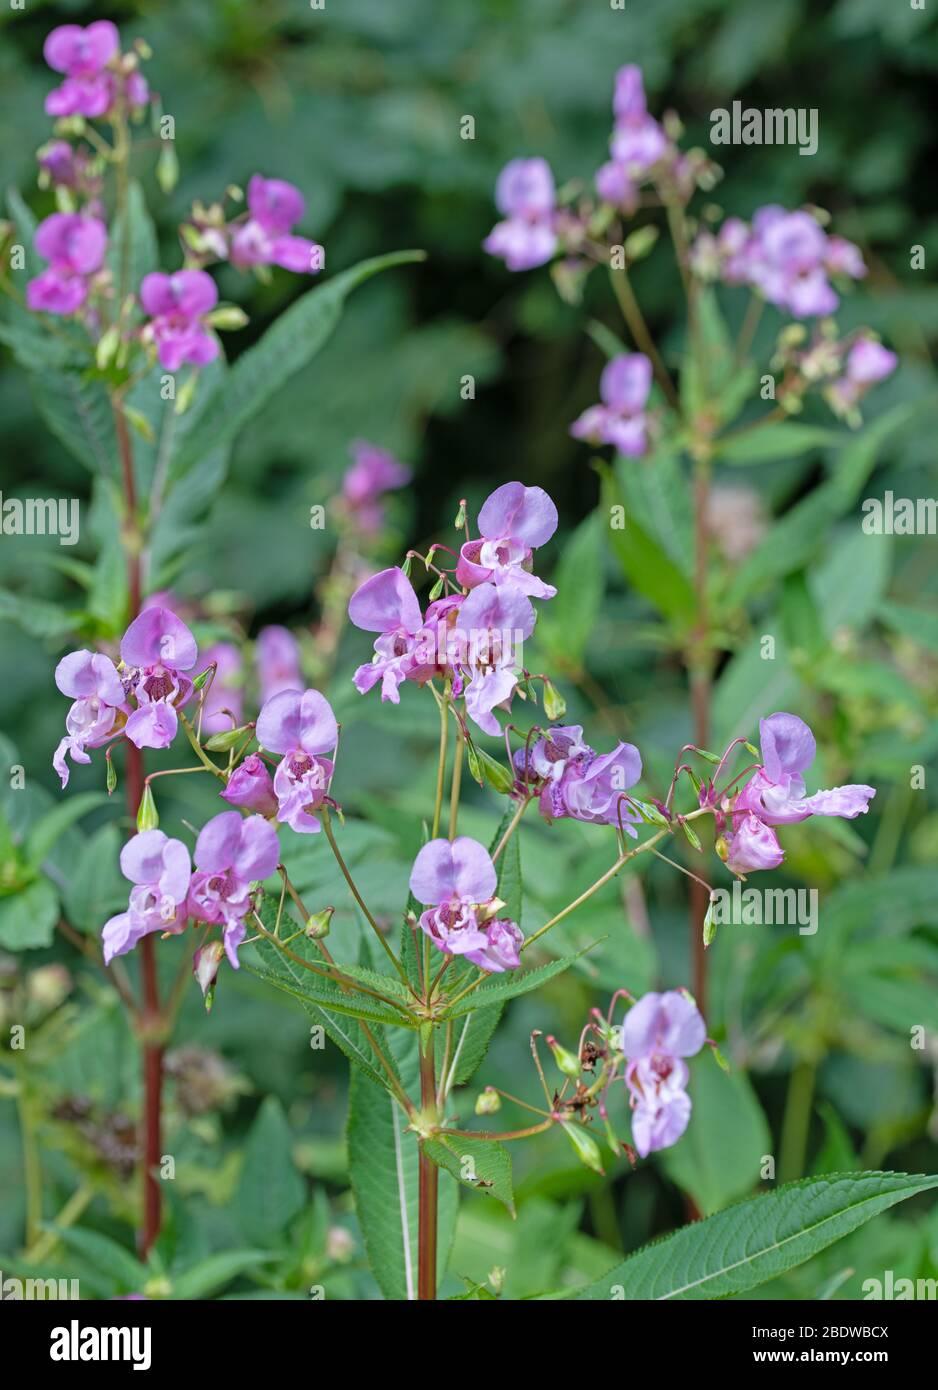 Flowering glandular balsam, Impatiens glandulifera Stock Photo